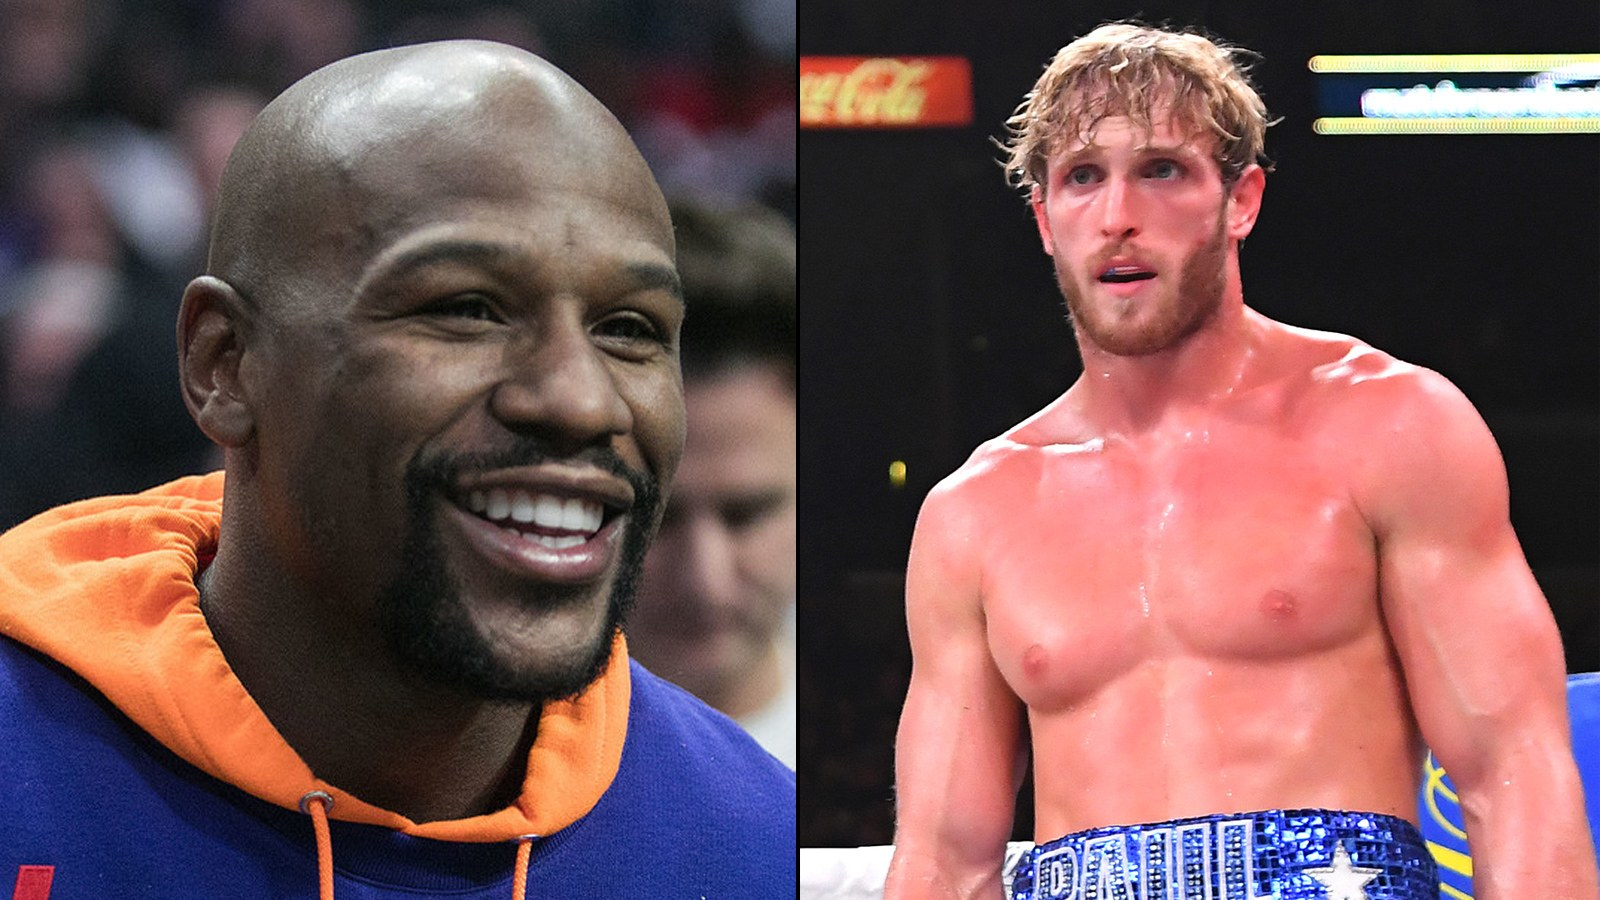 Combat Floyd Mayweather vs Logan Paul